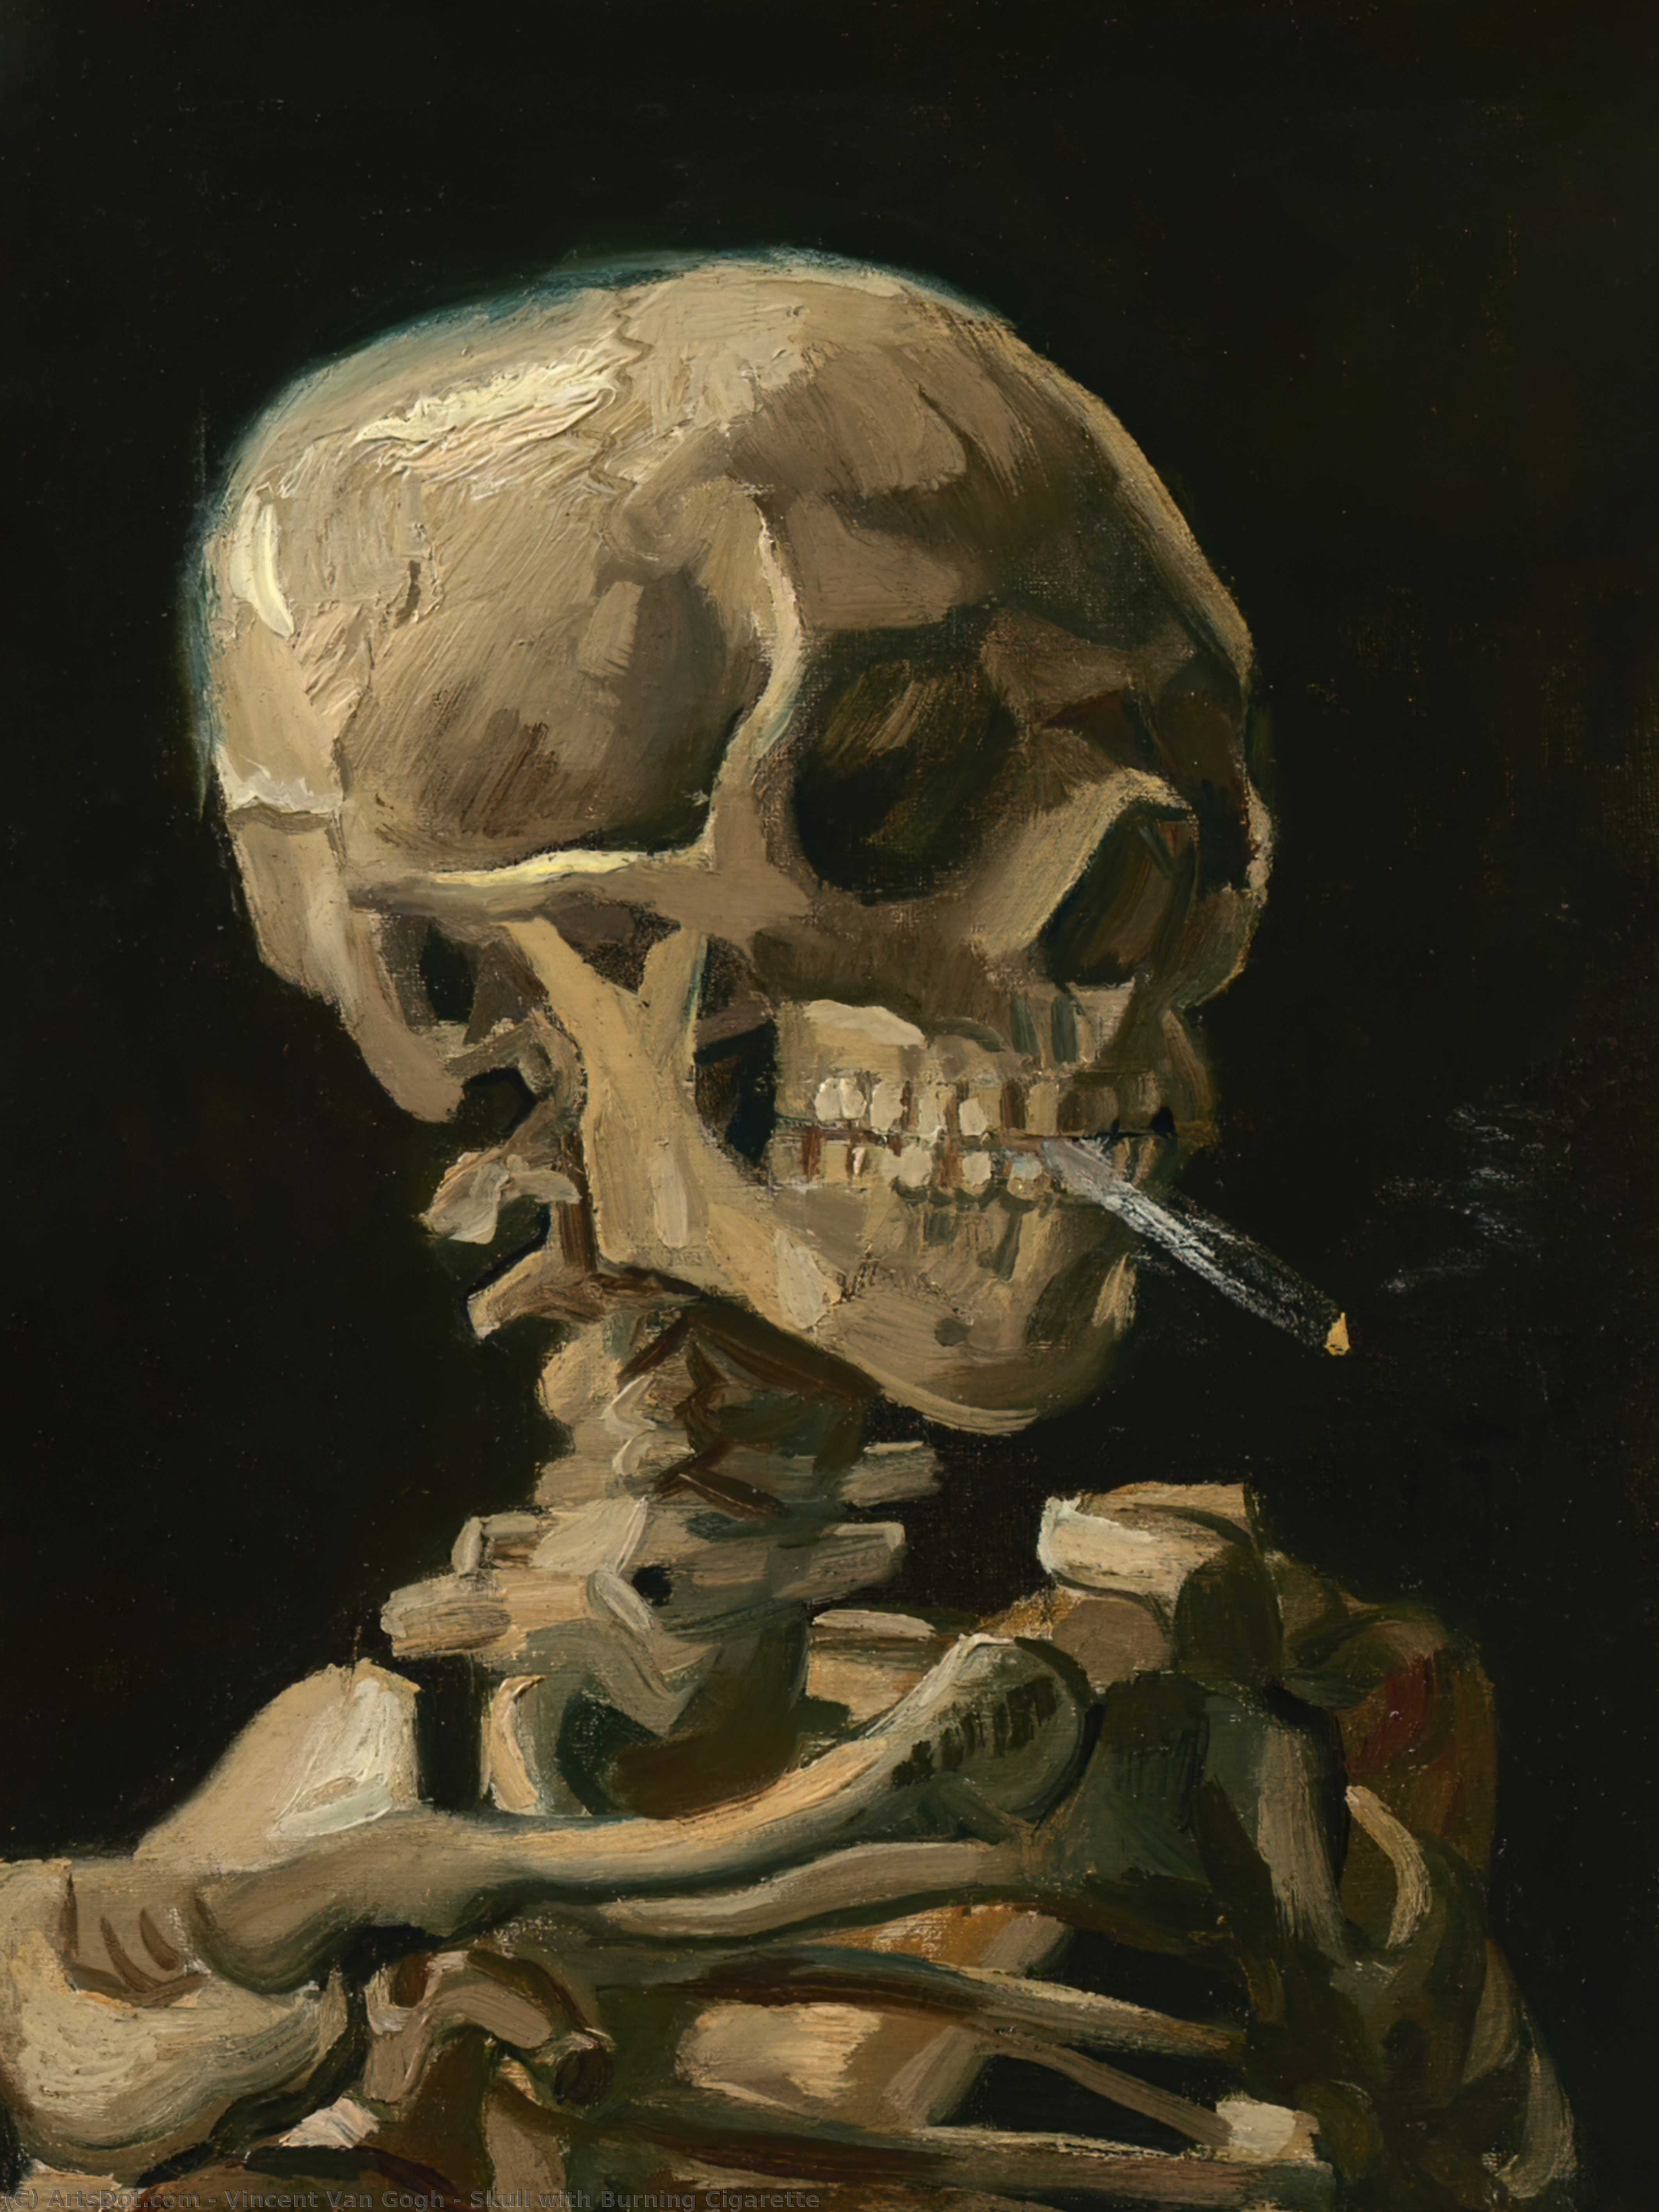 WikiOO.org - Güzel Sanatlar Ansiklopedisi - Resim, Resimler Vincent Van Gogh - Skull with Burning Cigarette